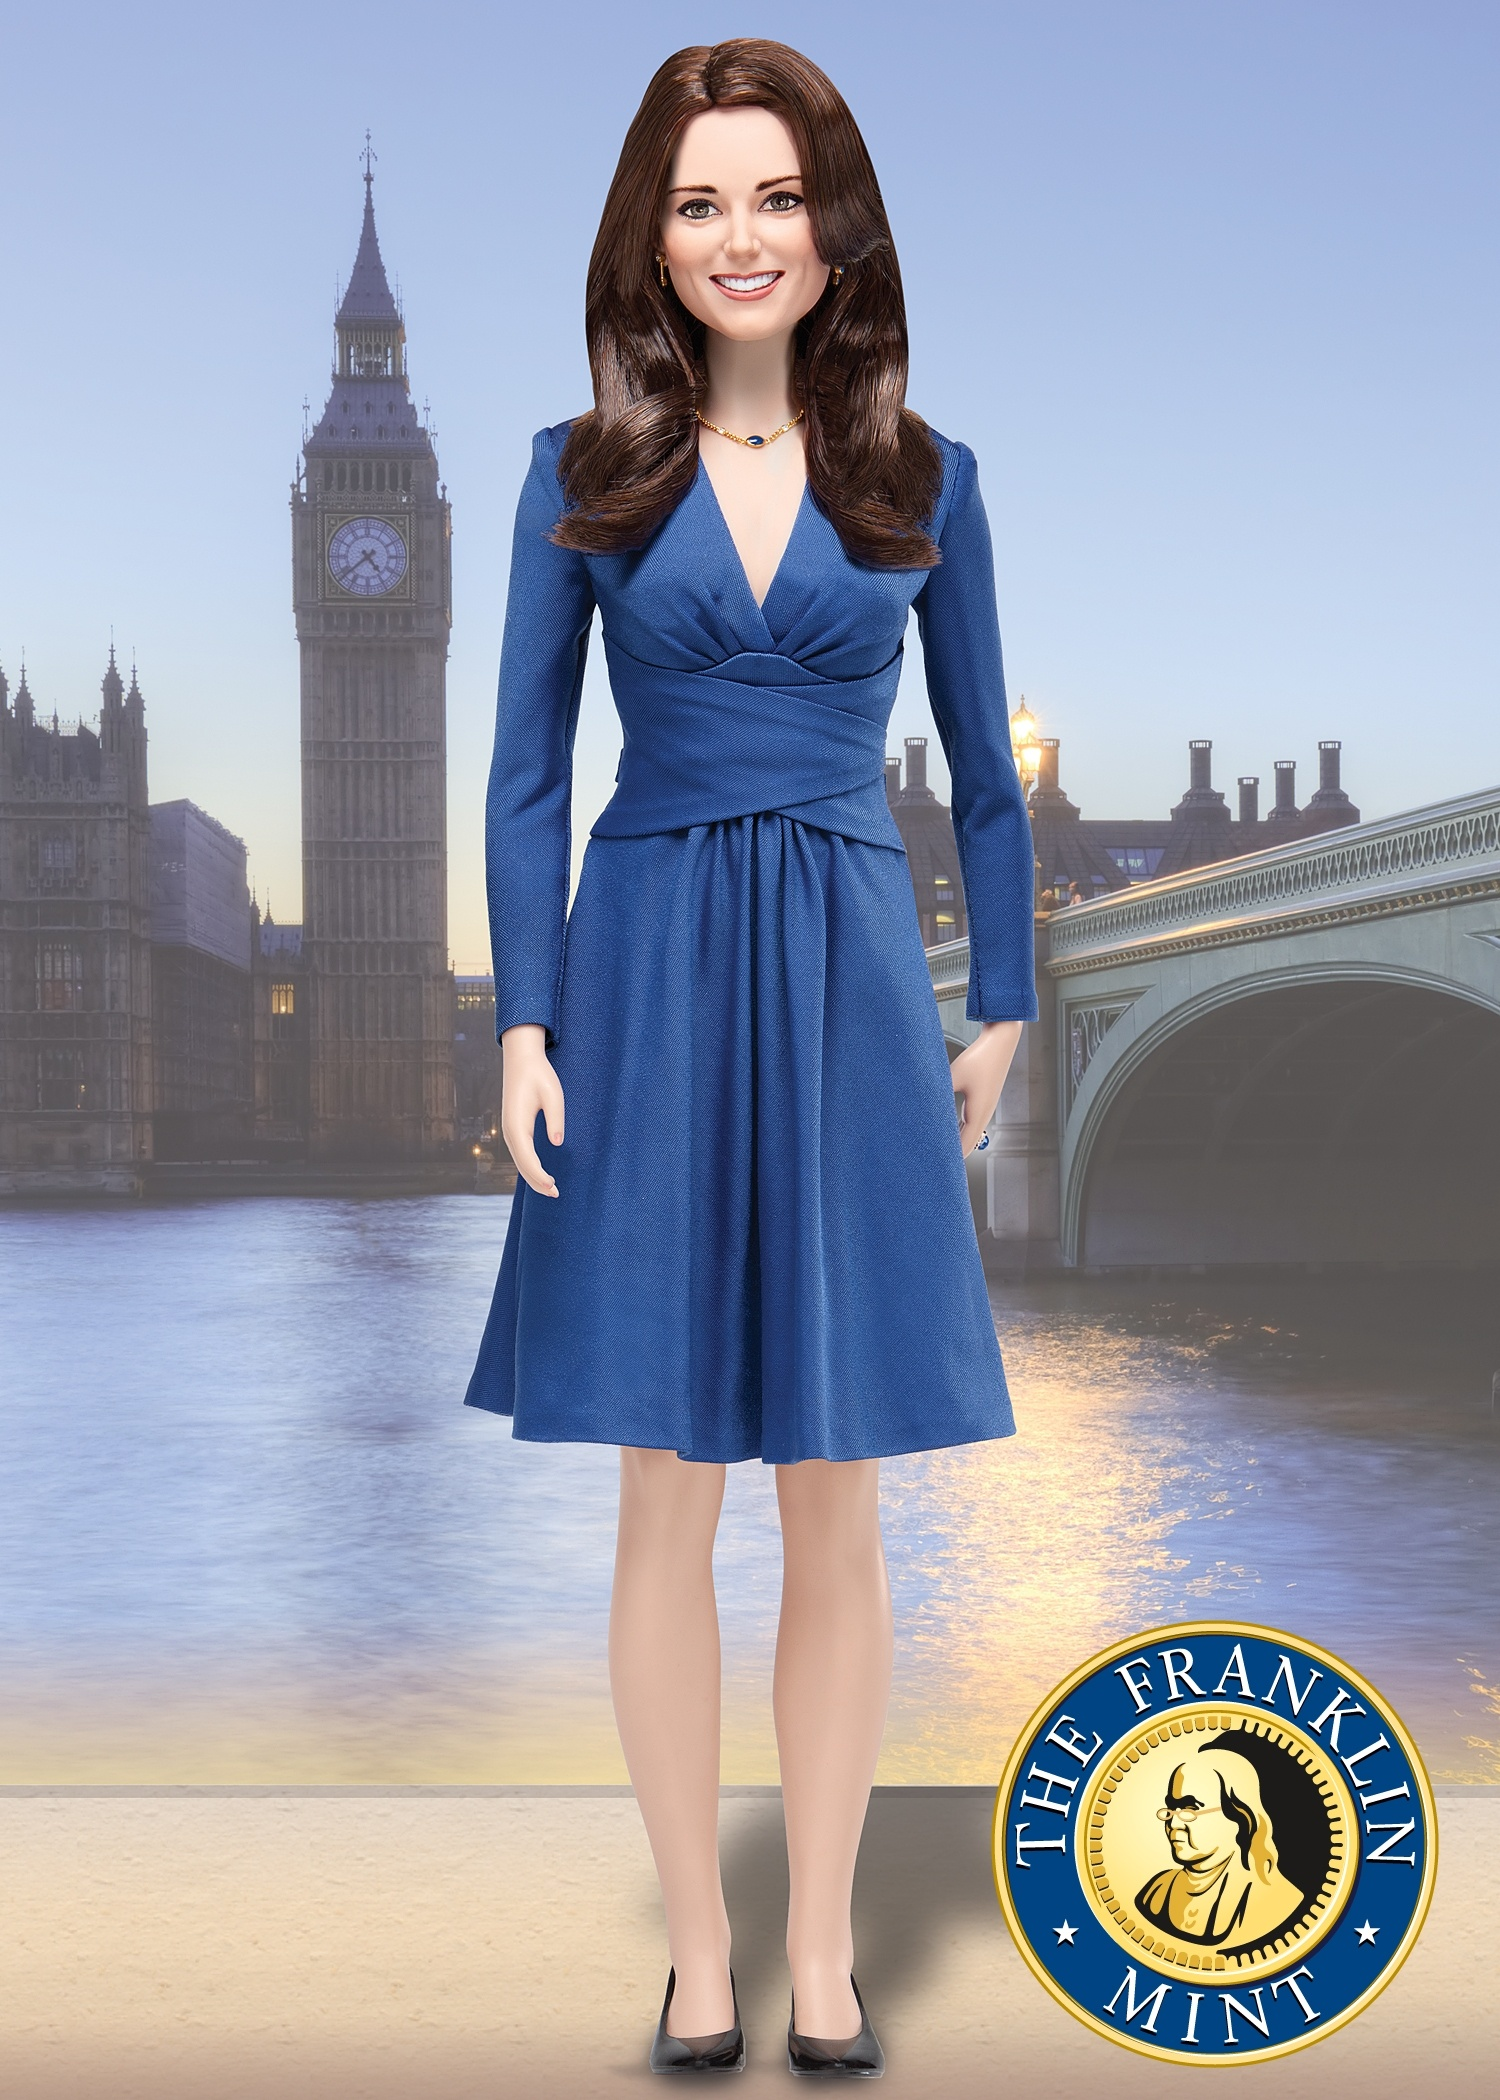 The Franklin Mint, Kate Middleton doll